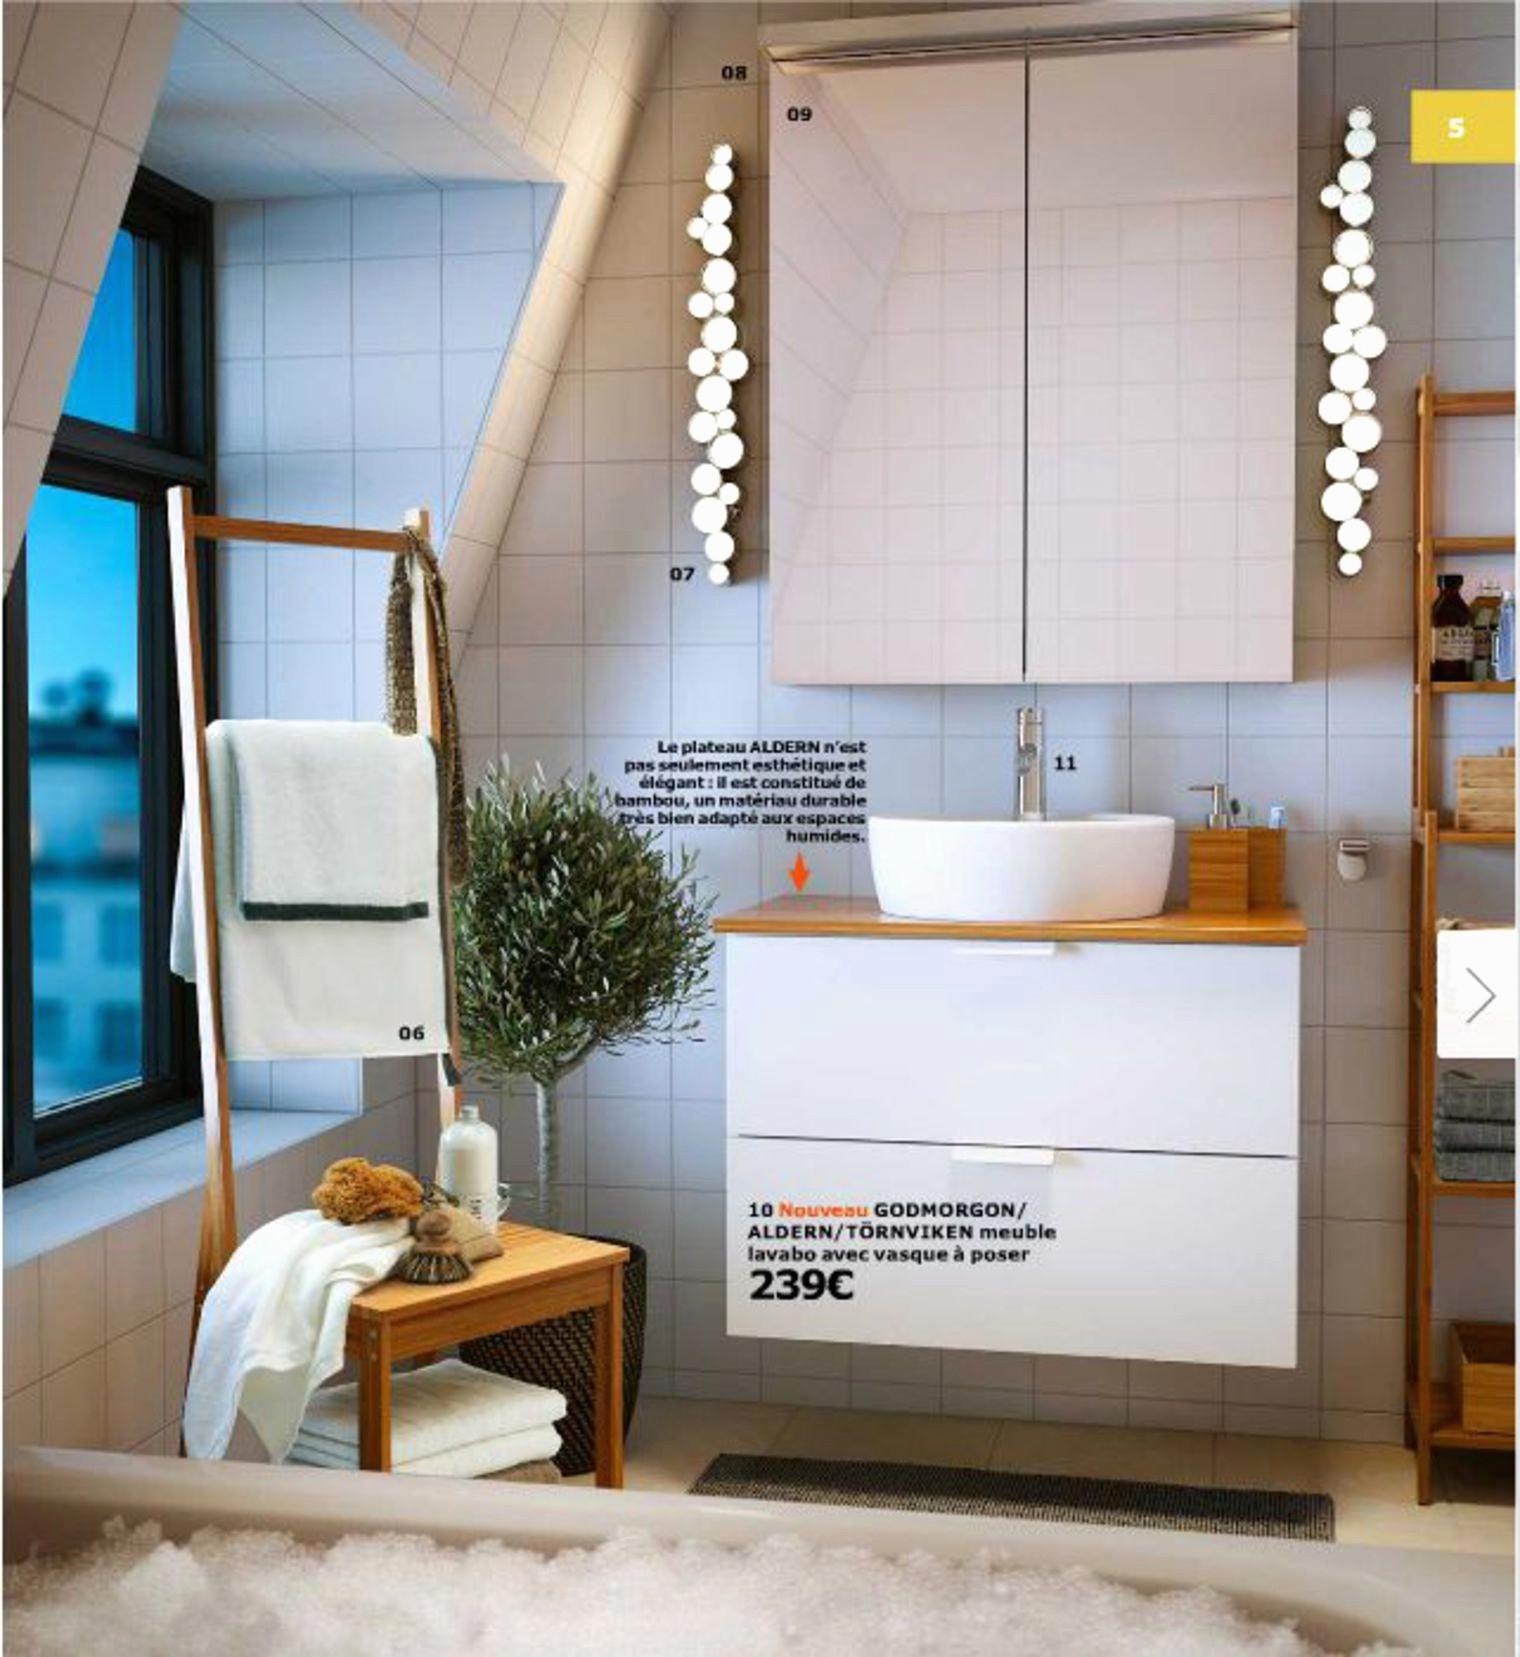 Luminaires Salle De Bain Ikea Beau Images 20 élégant Ikea Eclairage Salle De Bain Bain